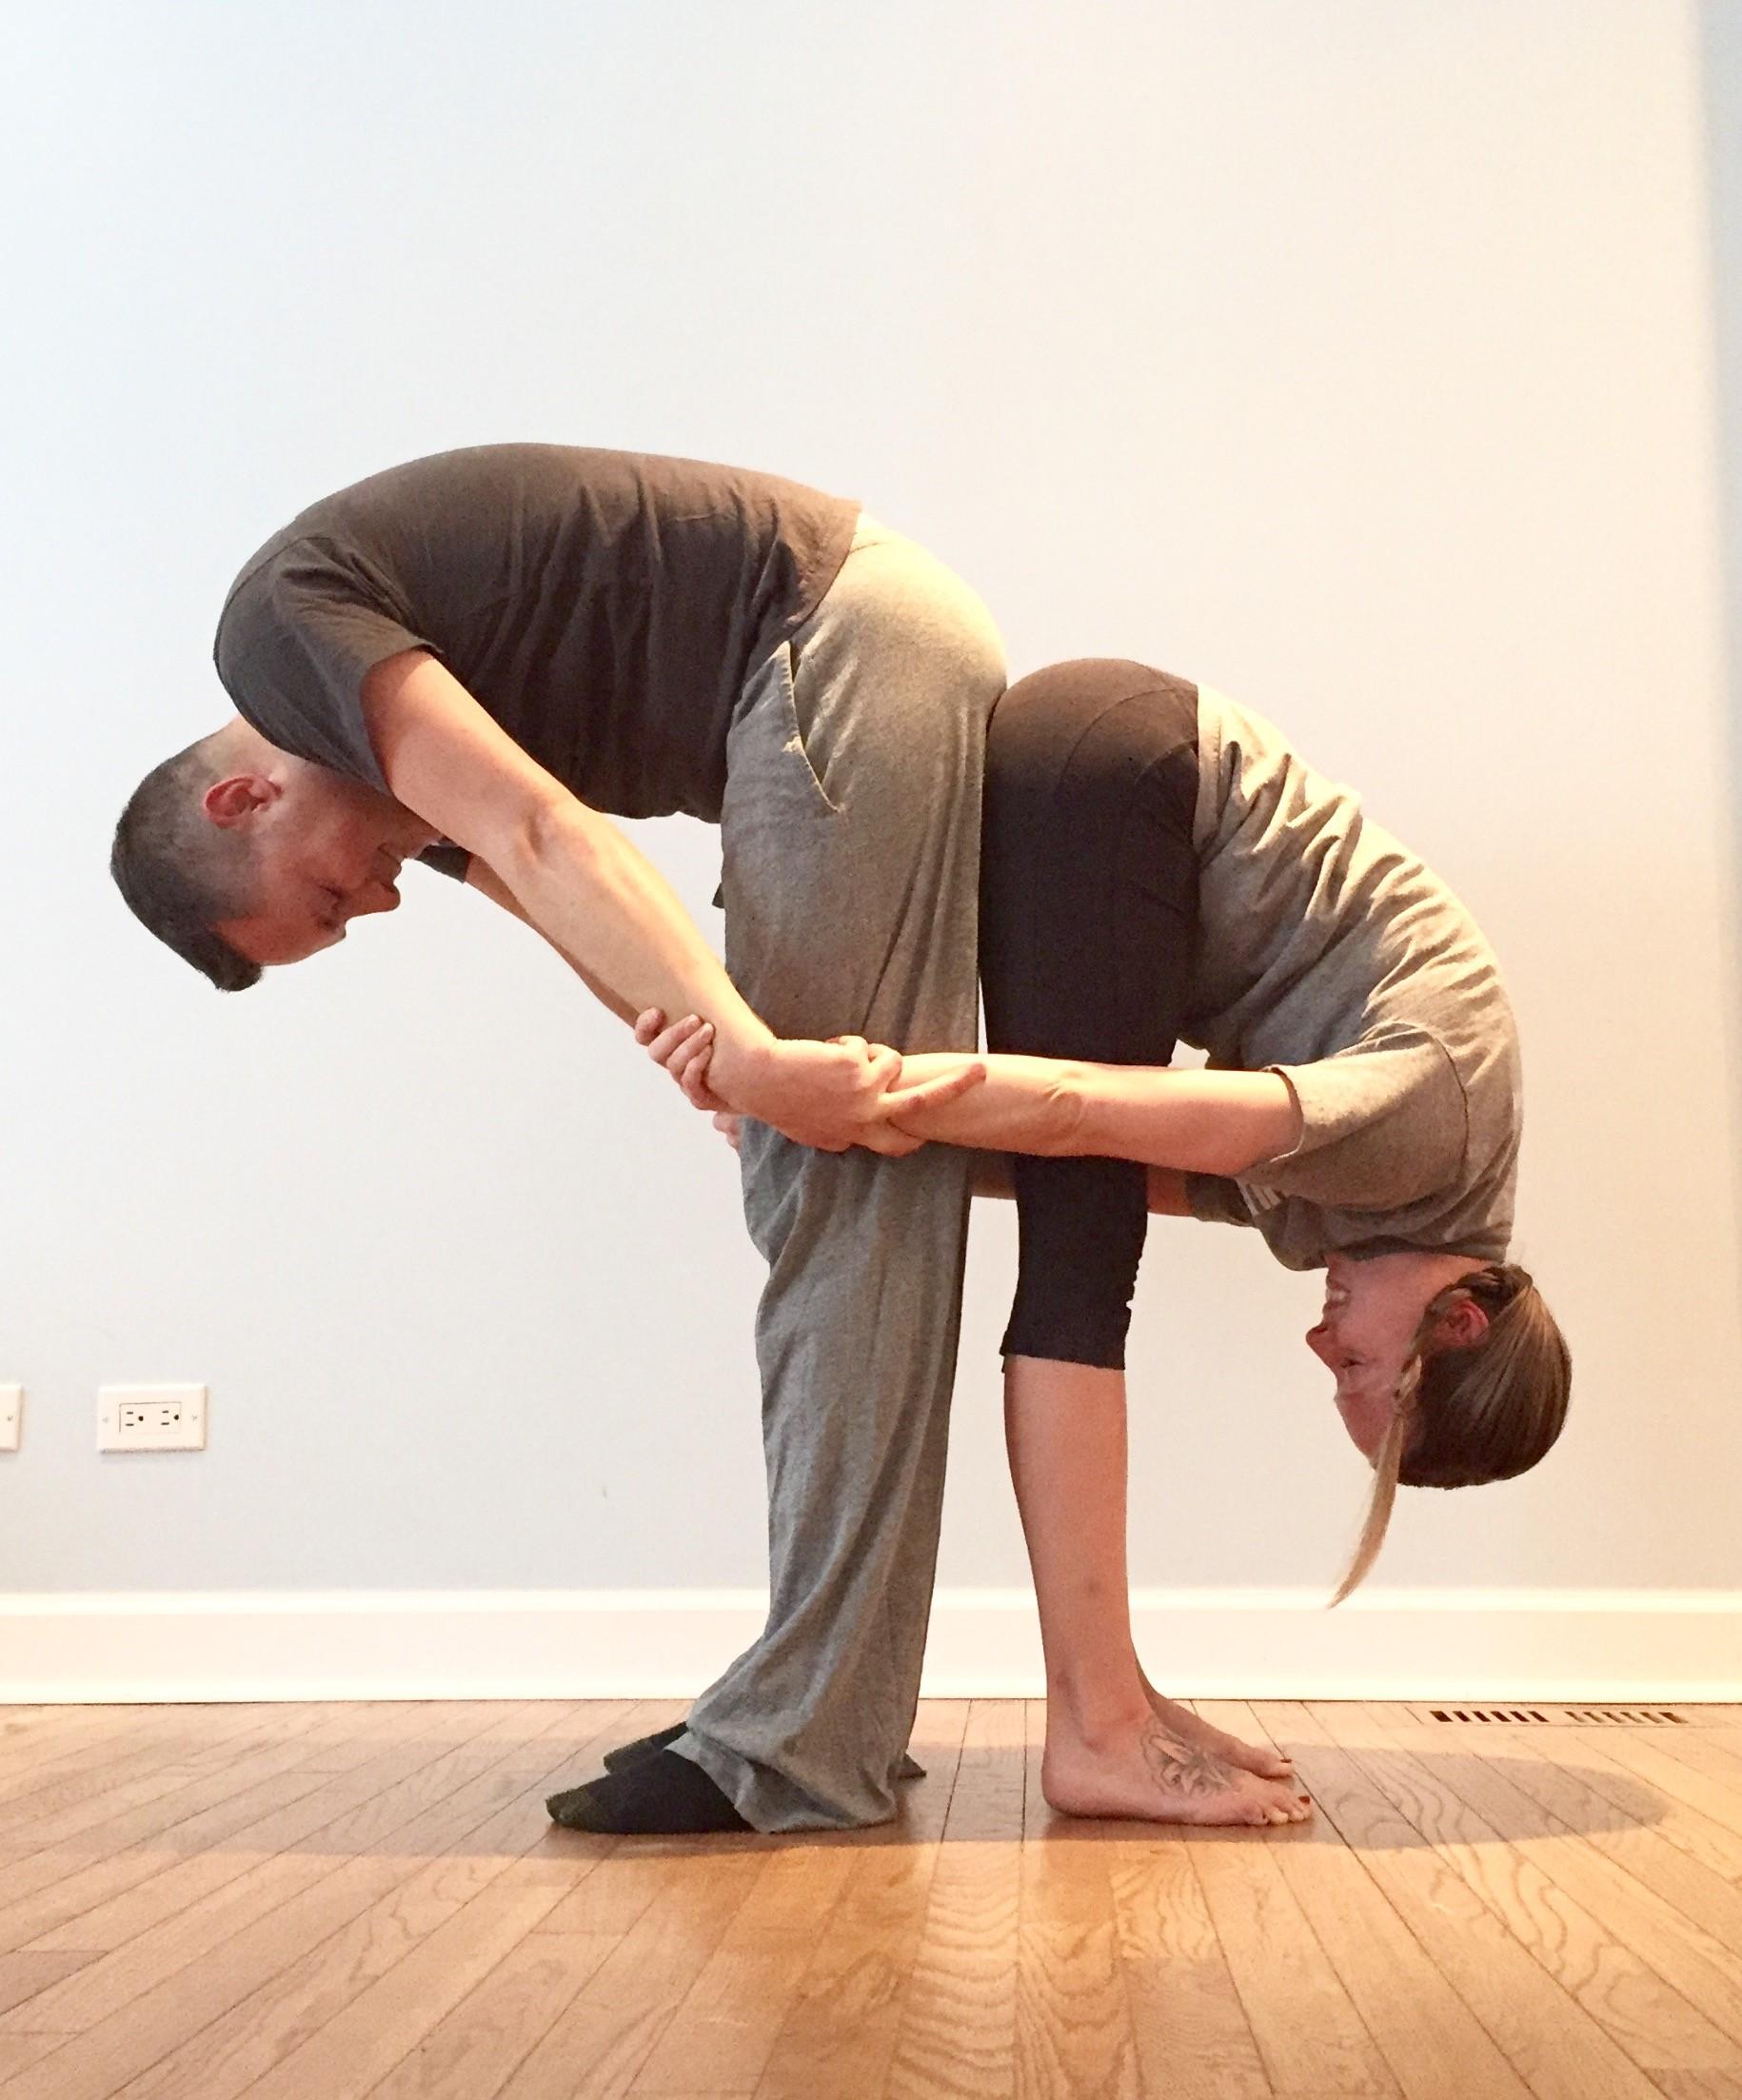 Stretch of the Week 2 - Forward Fold Partner